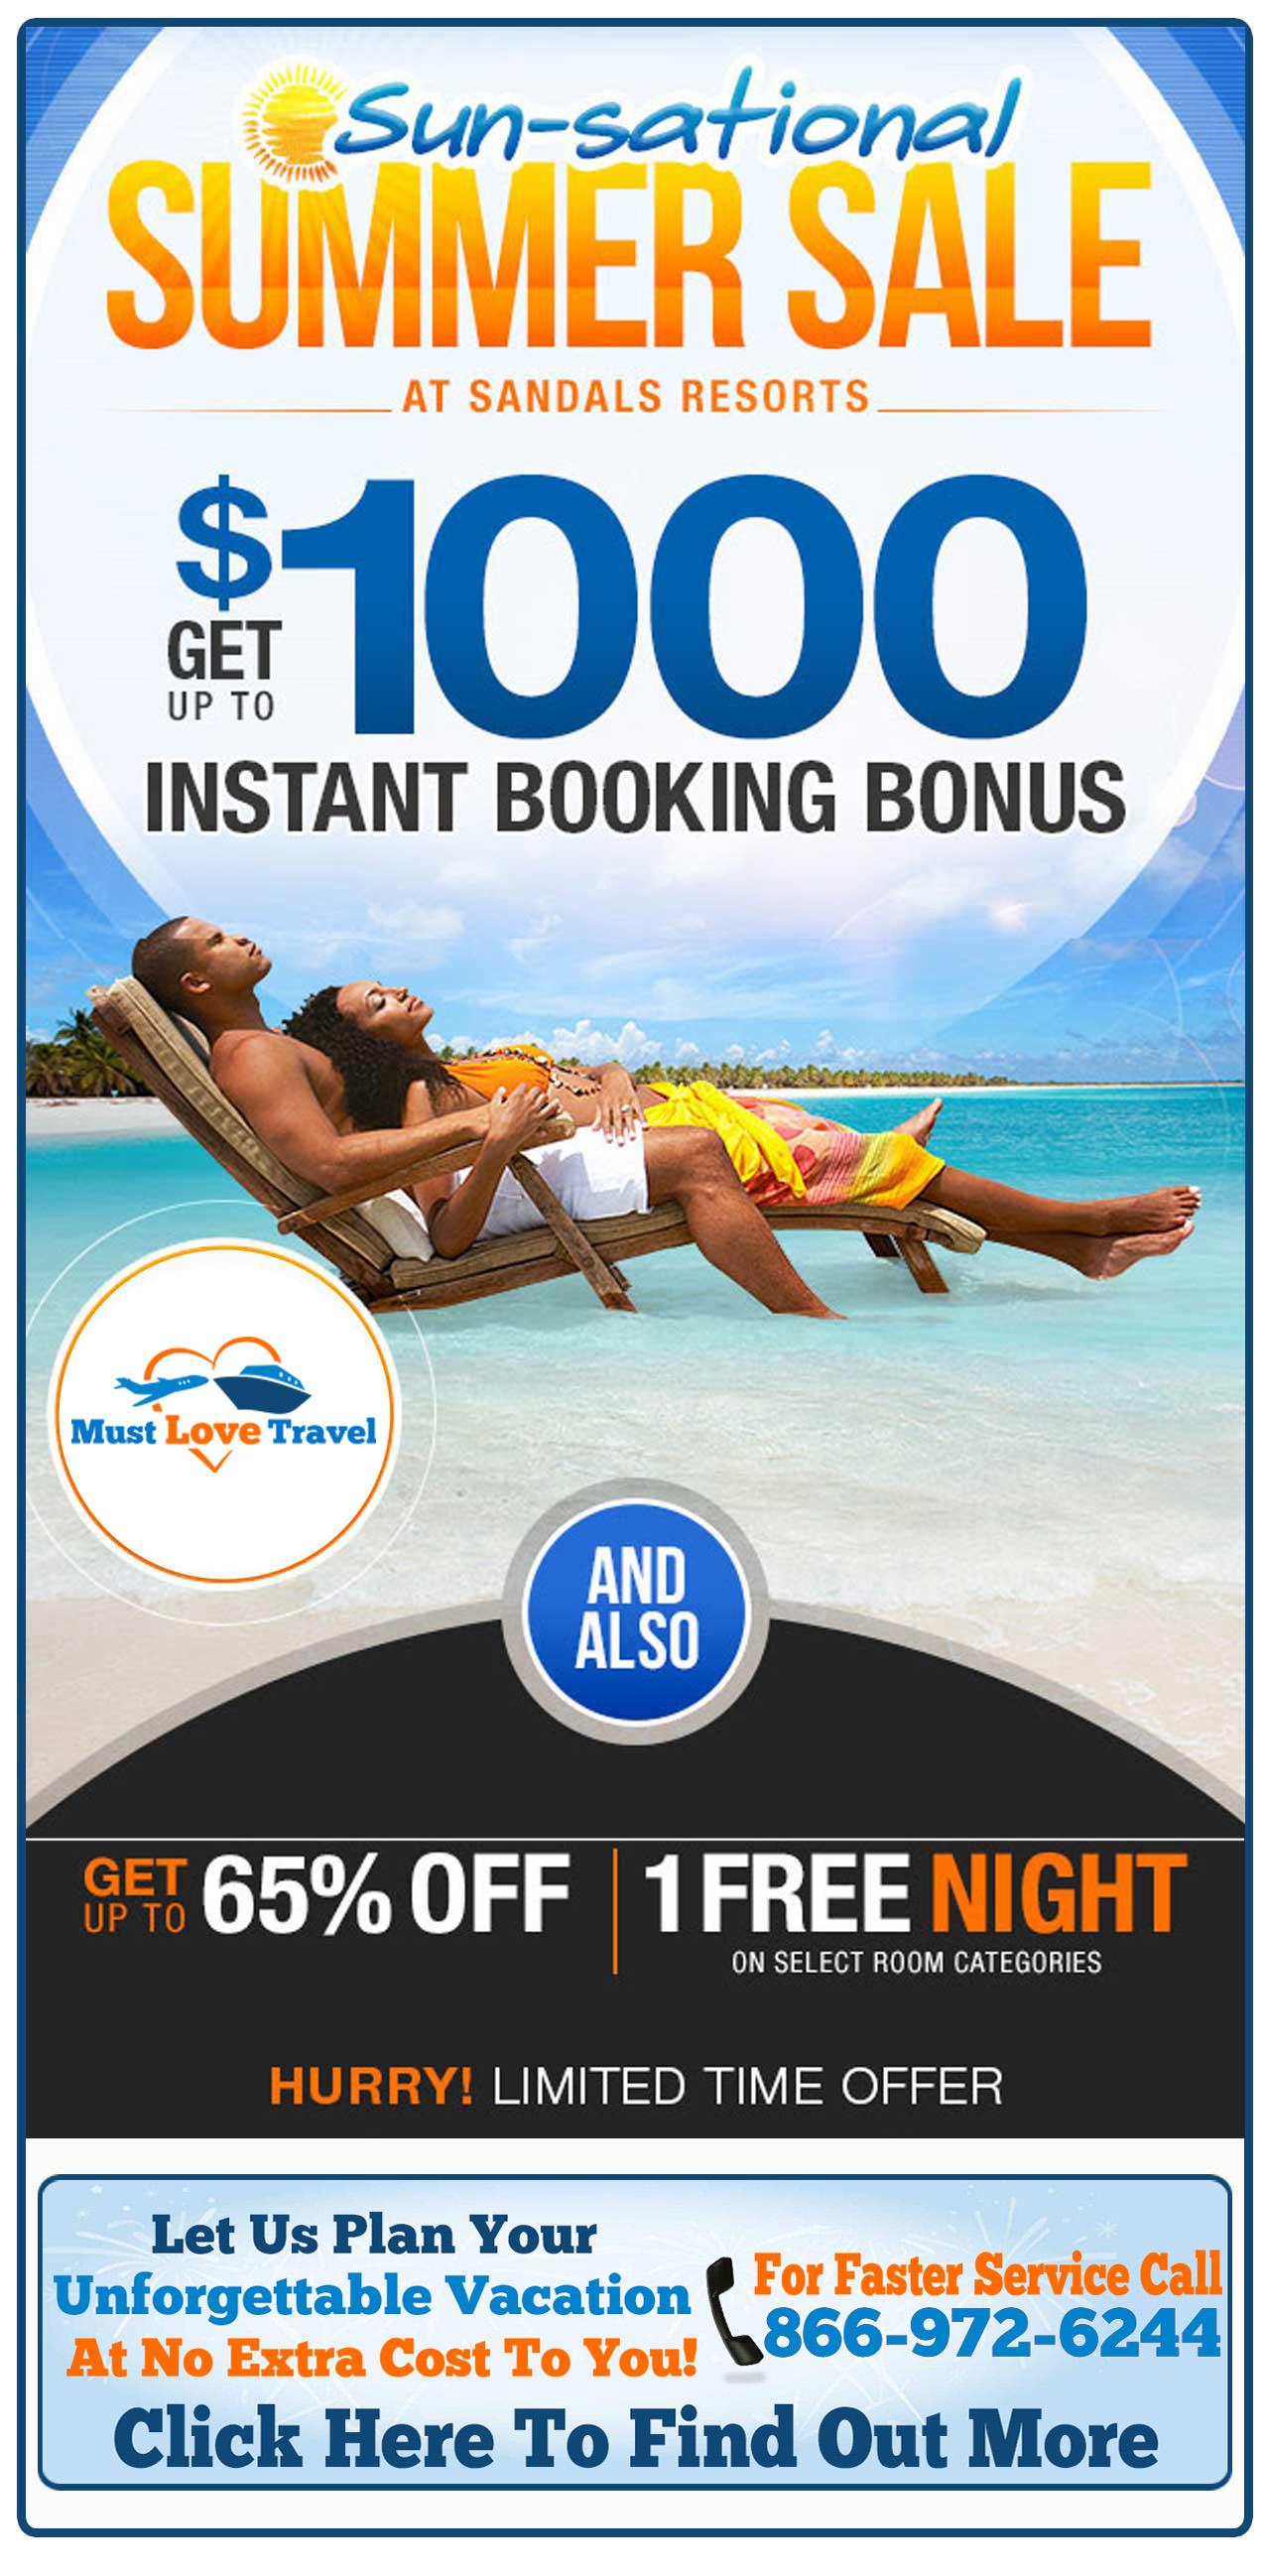 783174b13f13d Sun-sational Summer Sale At Sandals Resorts - Must Love Travel